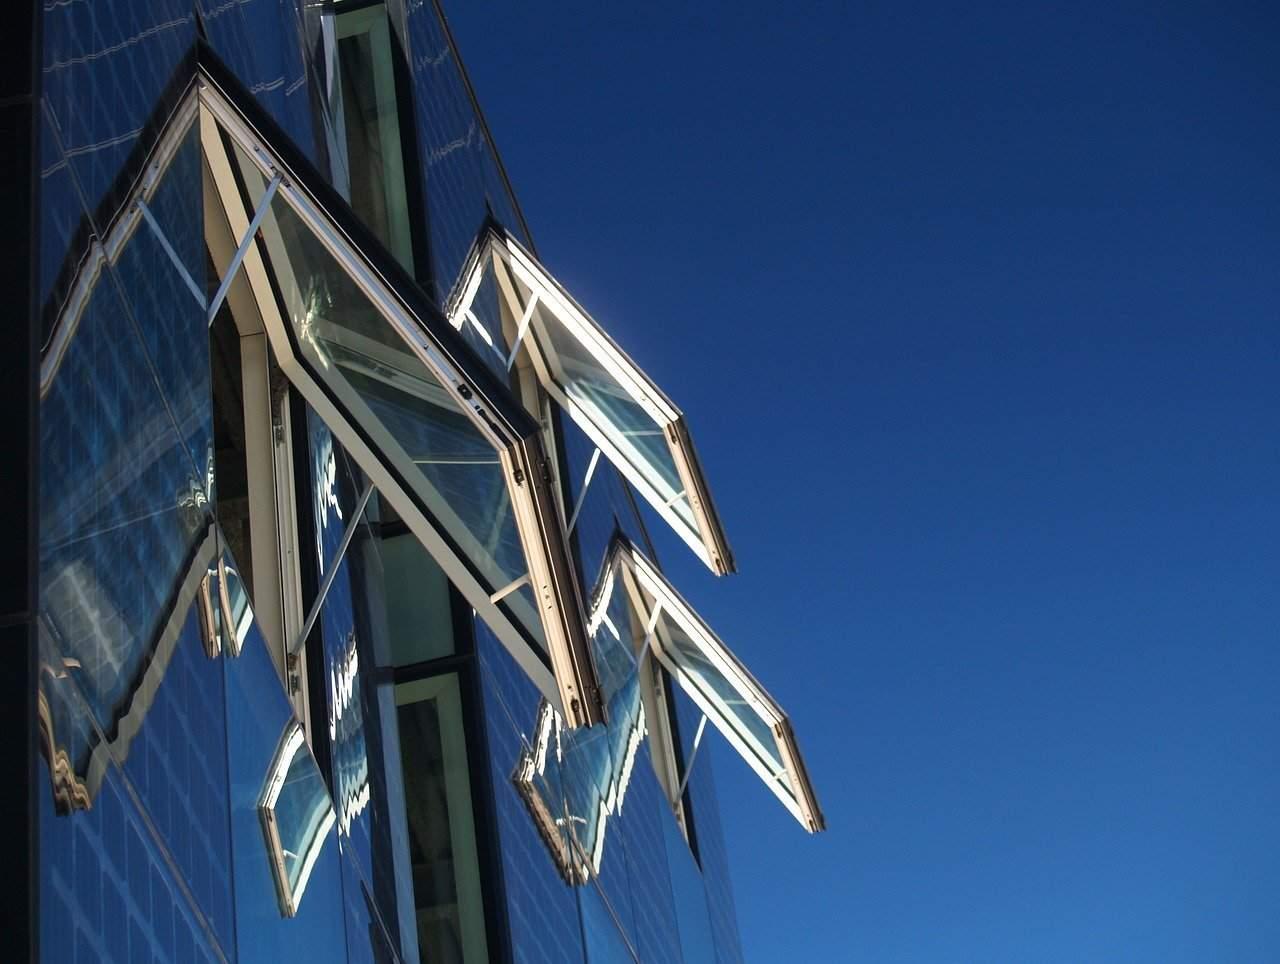 Glass Aluminium Operable Windows Canuck Door Systems Co